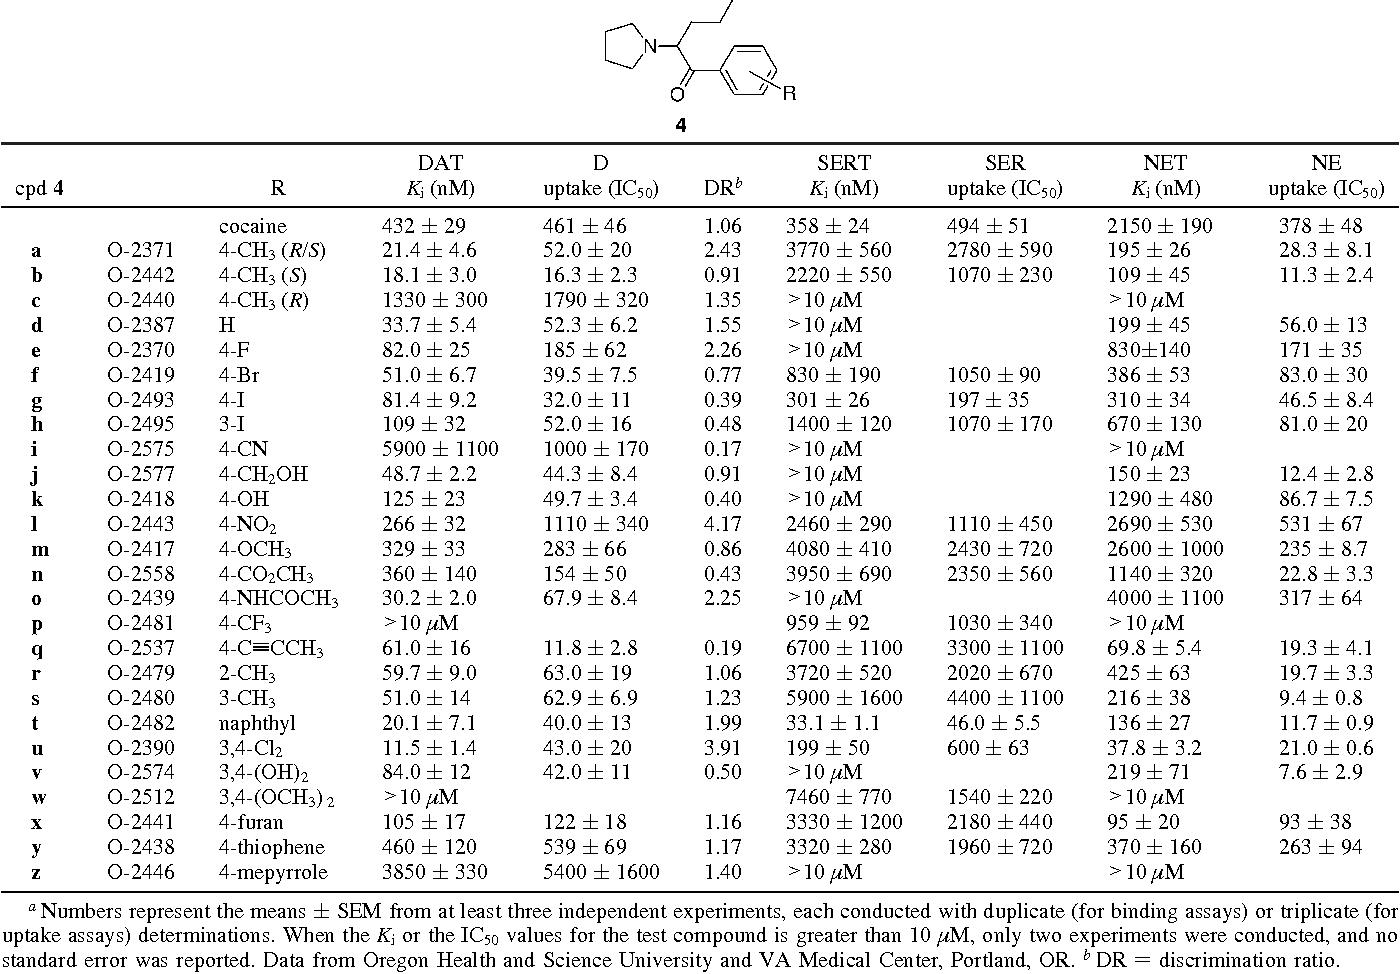 1-(4-Methylphenyl)-2-pyrrolidin-1-yl-pentan-1-one (Pyrovalerone